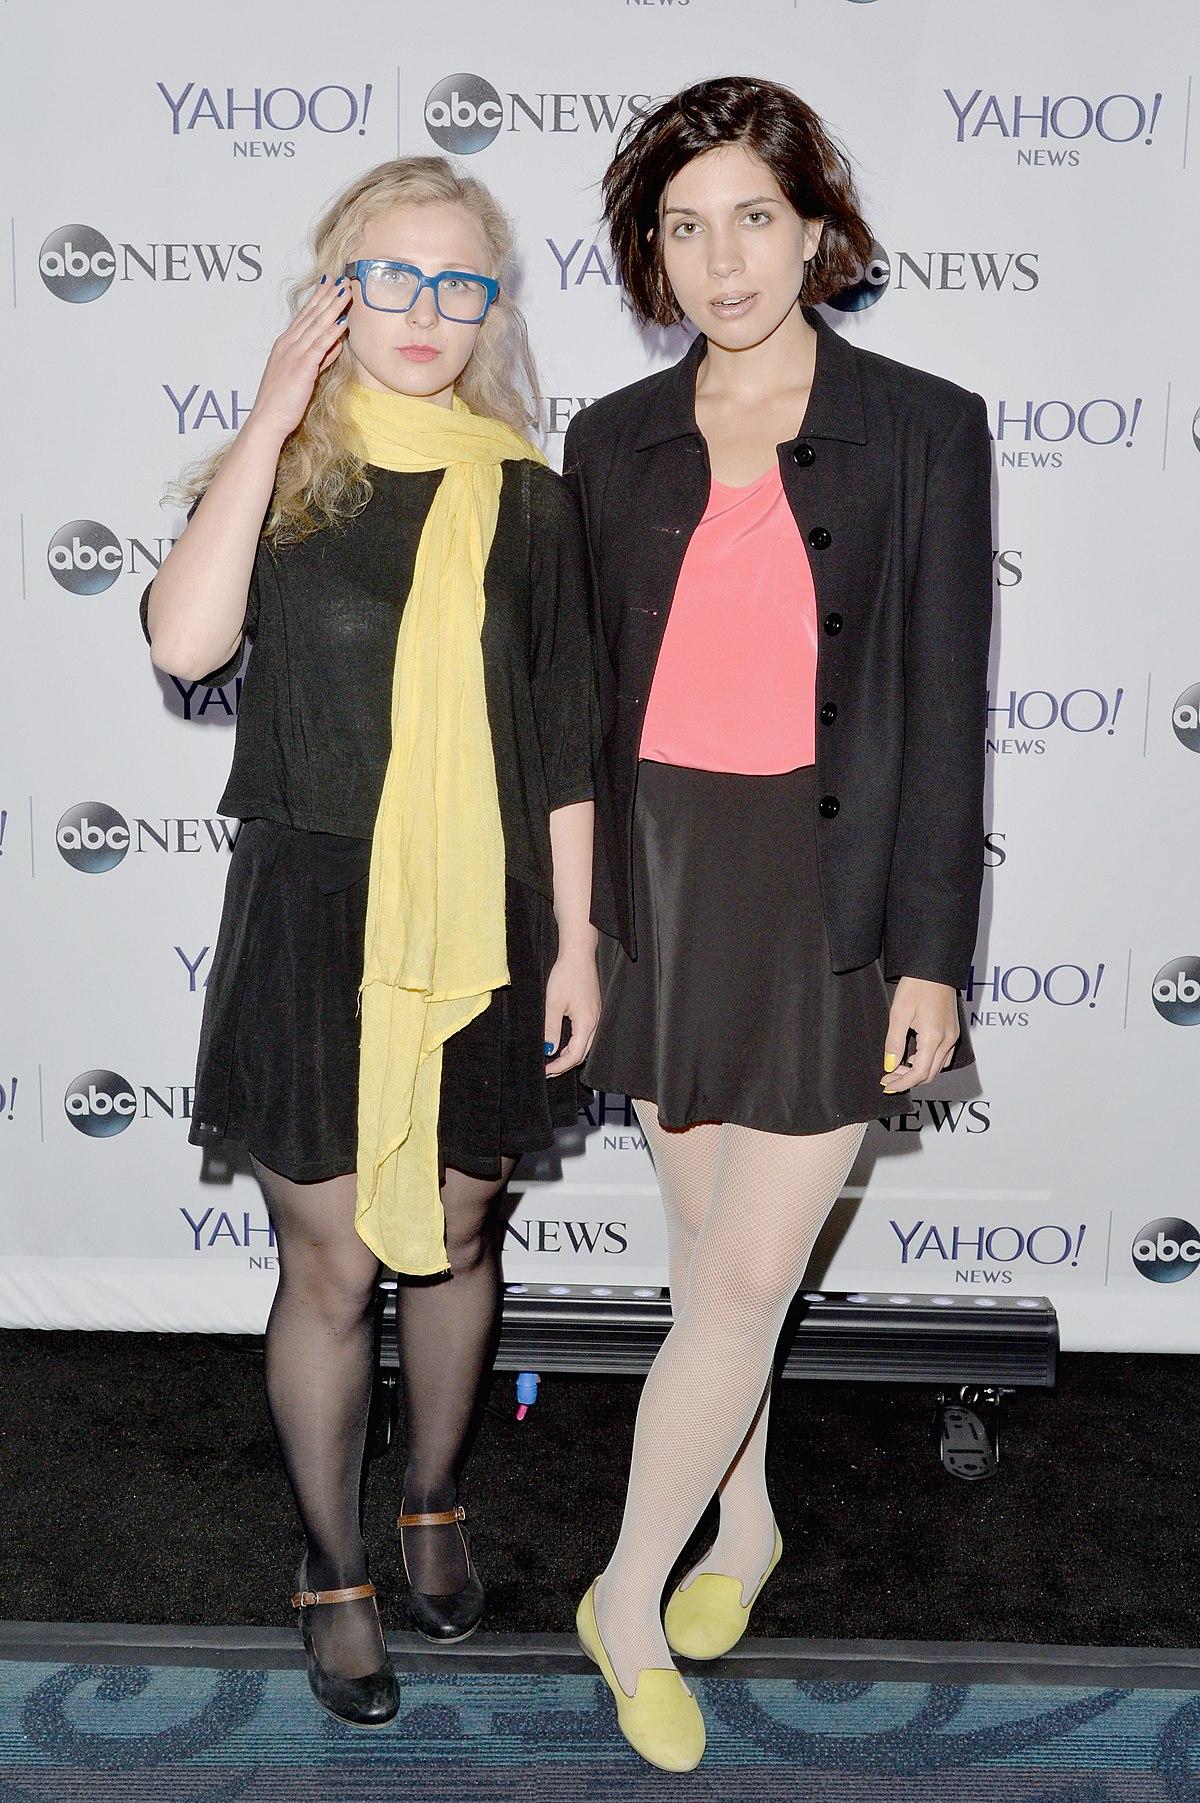 Maria Alyokhina and Nadezhda Tolokonnikova.jpg